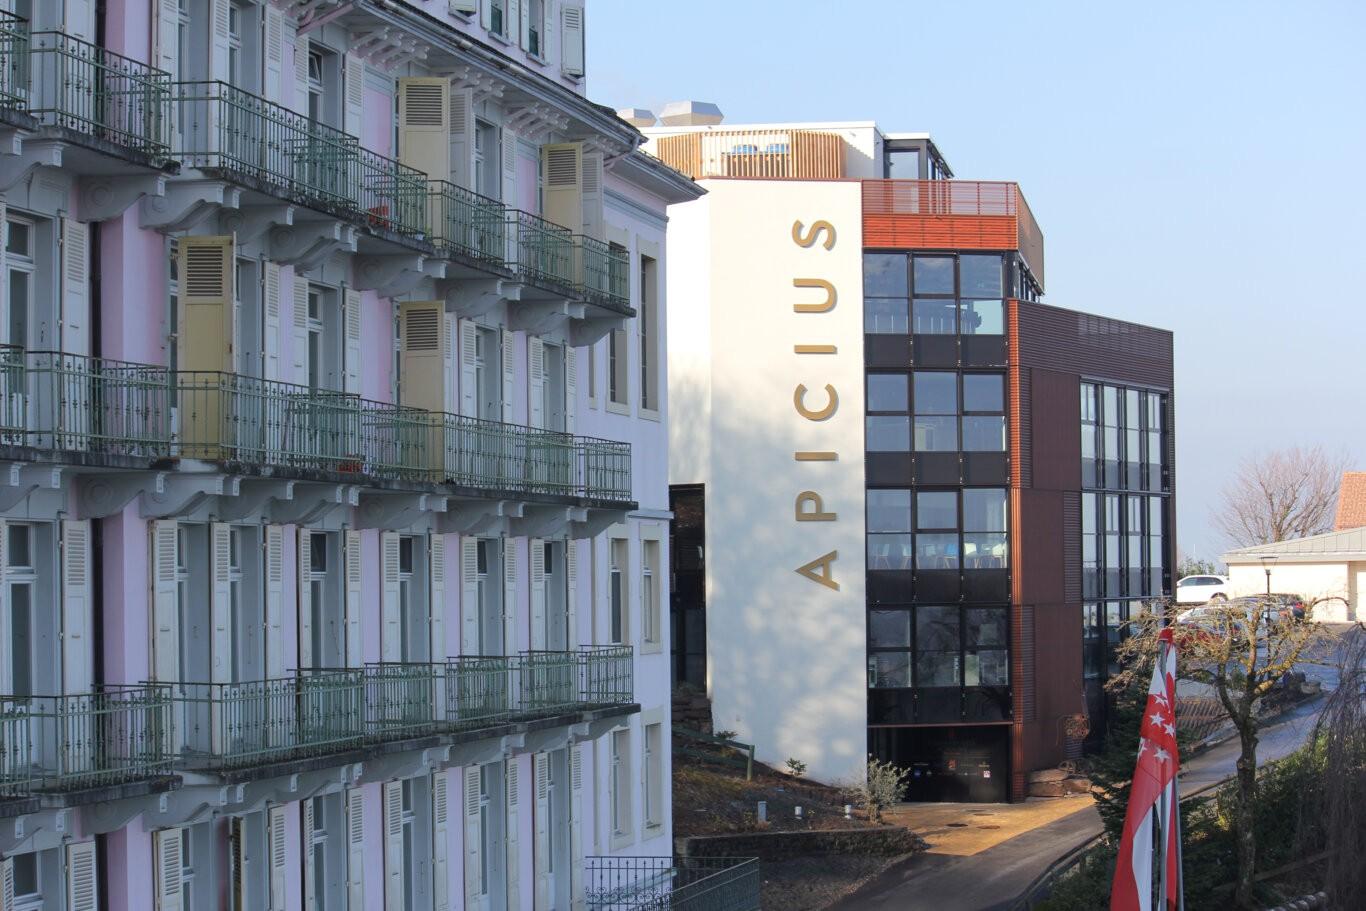 CAAS culinary arts academy switzerland